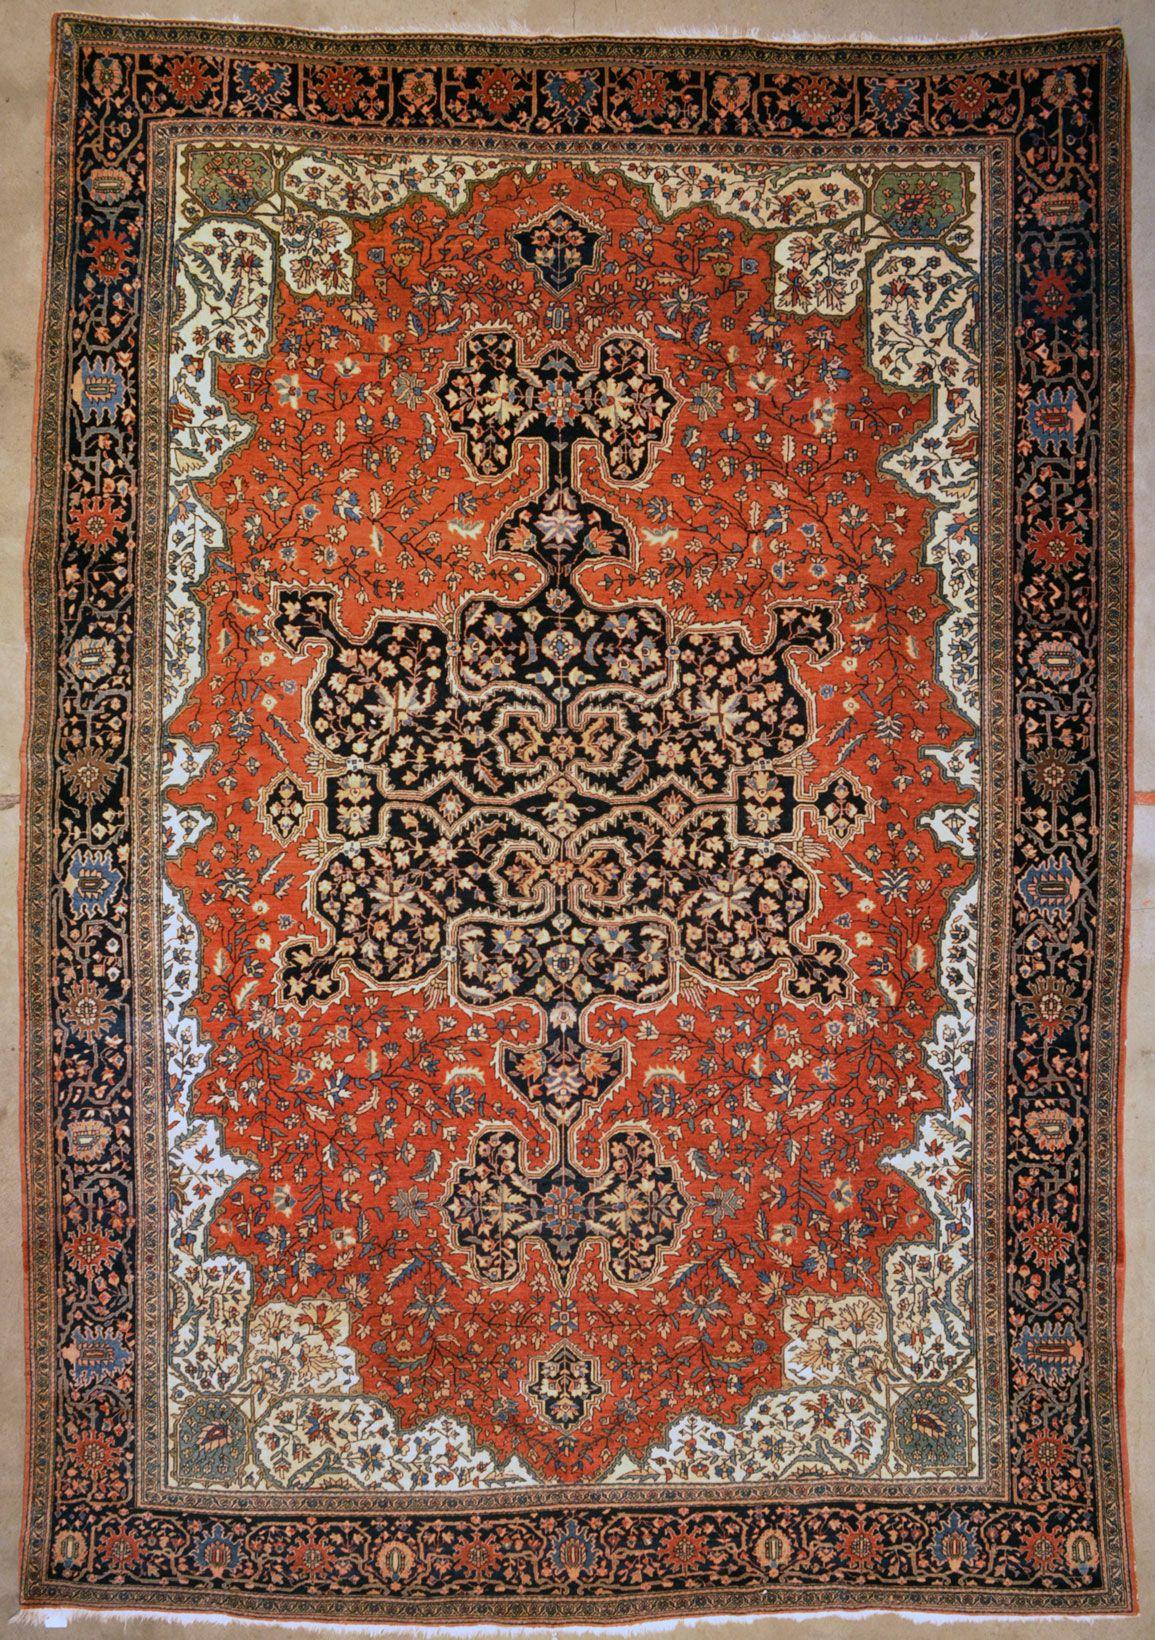 Antique Farahan Sarouk Rug Rugs More Rugs 6x9 Area Rugs Antique Persian Rug